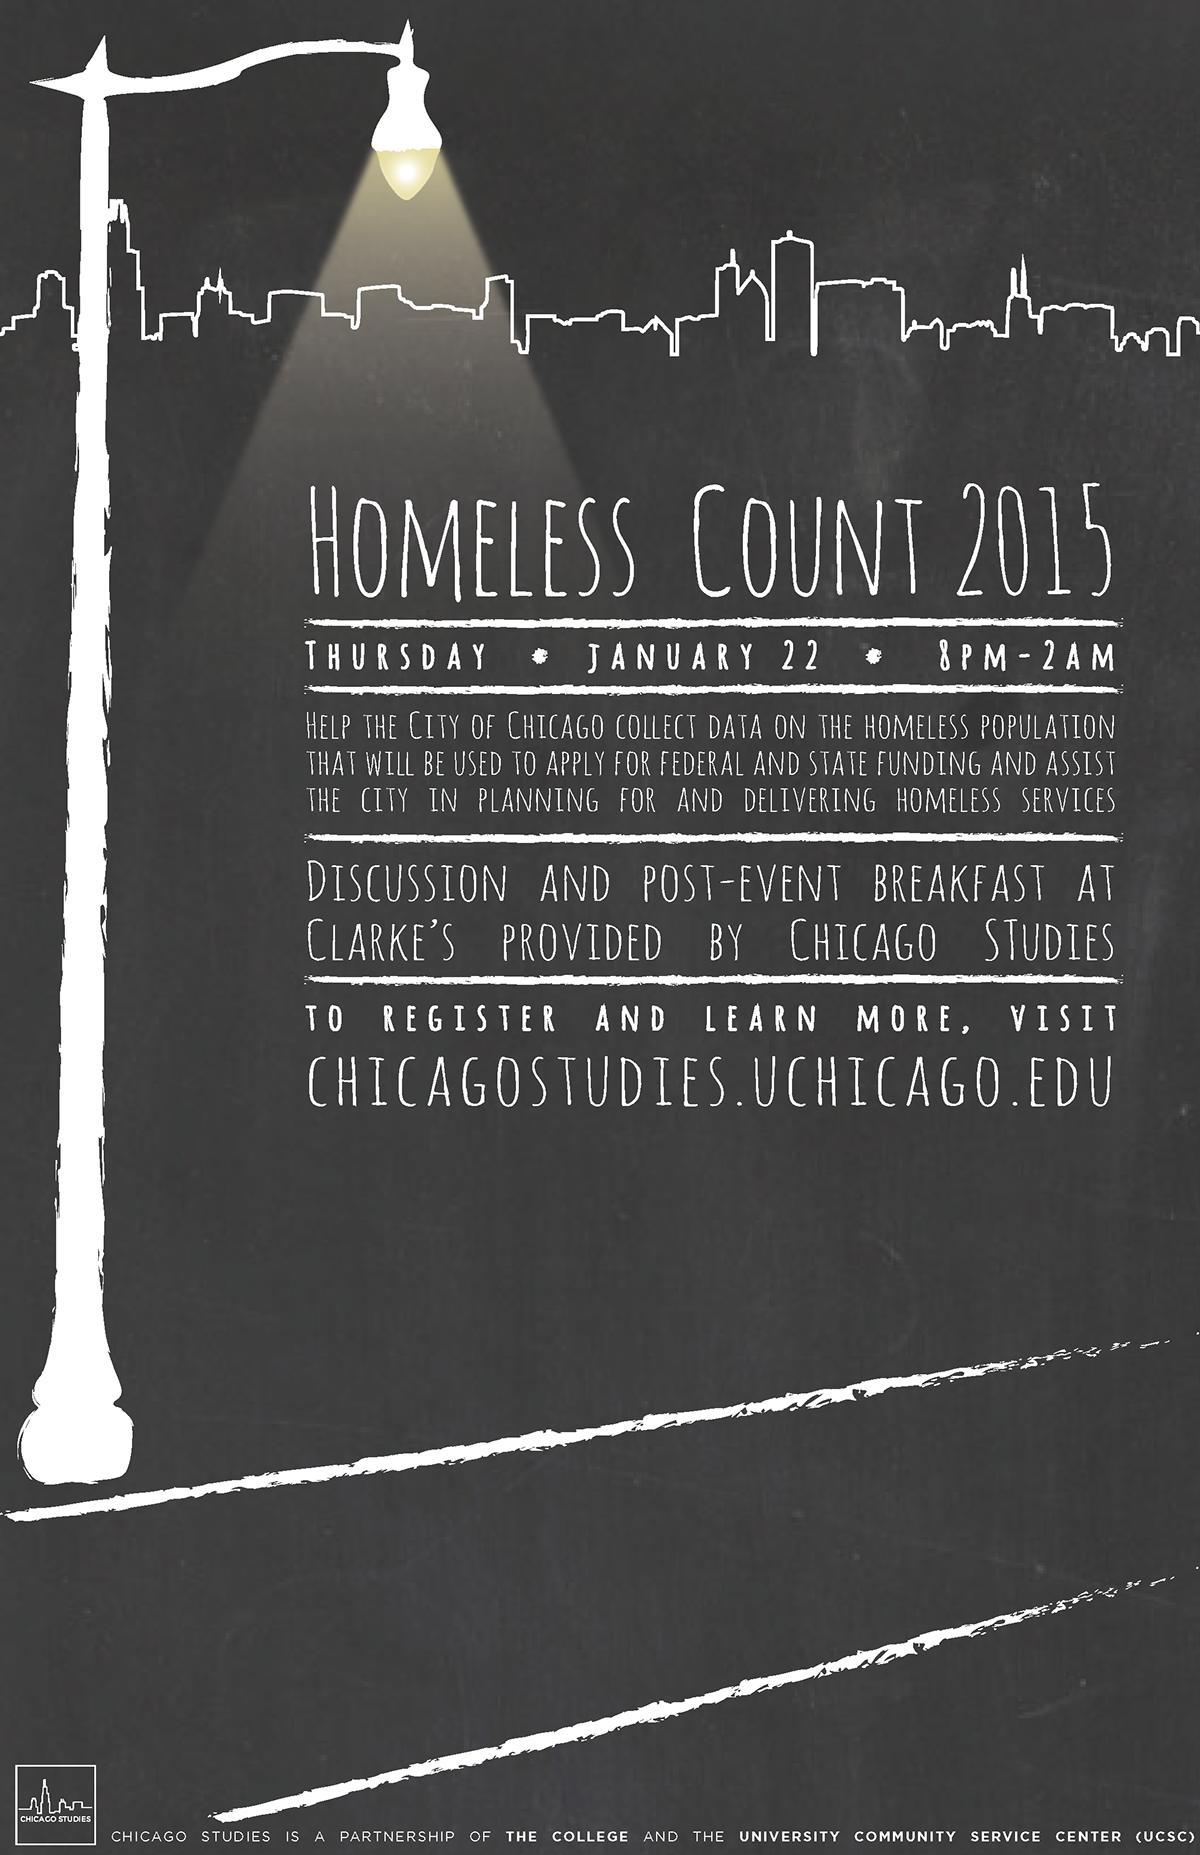 Homeless Count Chicago 2014 Poster Chalkboard Graphic Design Chicago Studies Anneka Van Scoyoc On Behance Homeless Brochure Design Poster Design